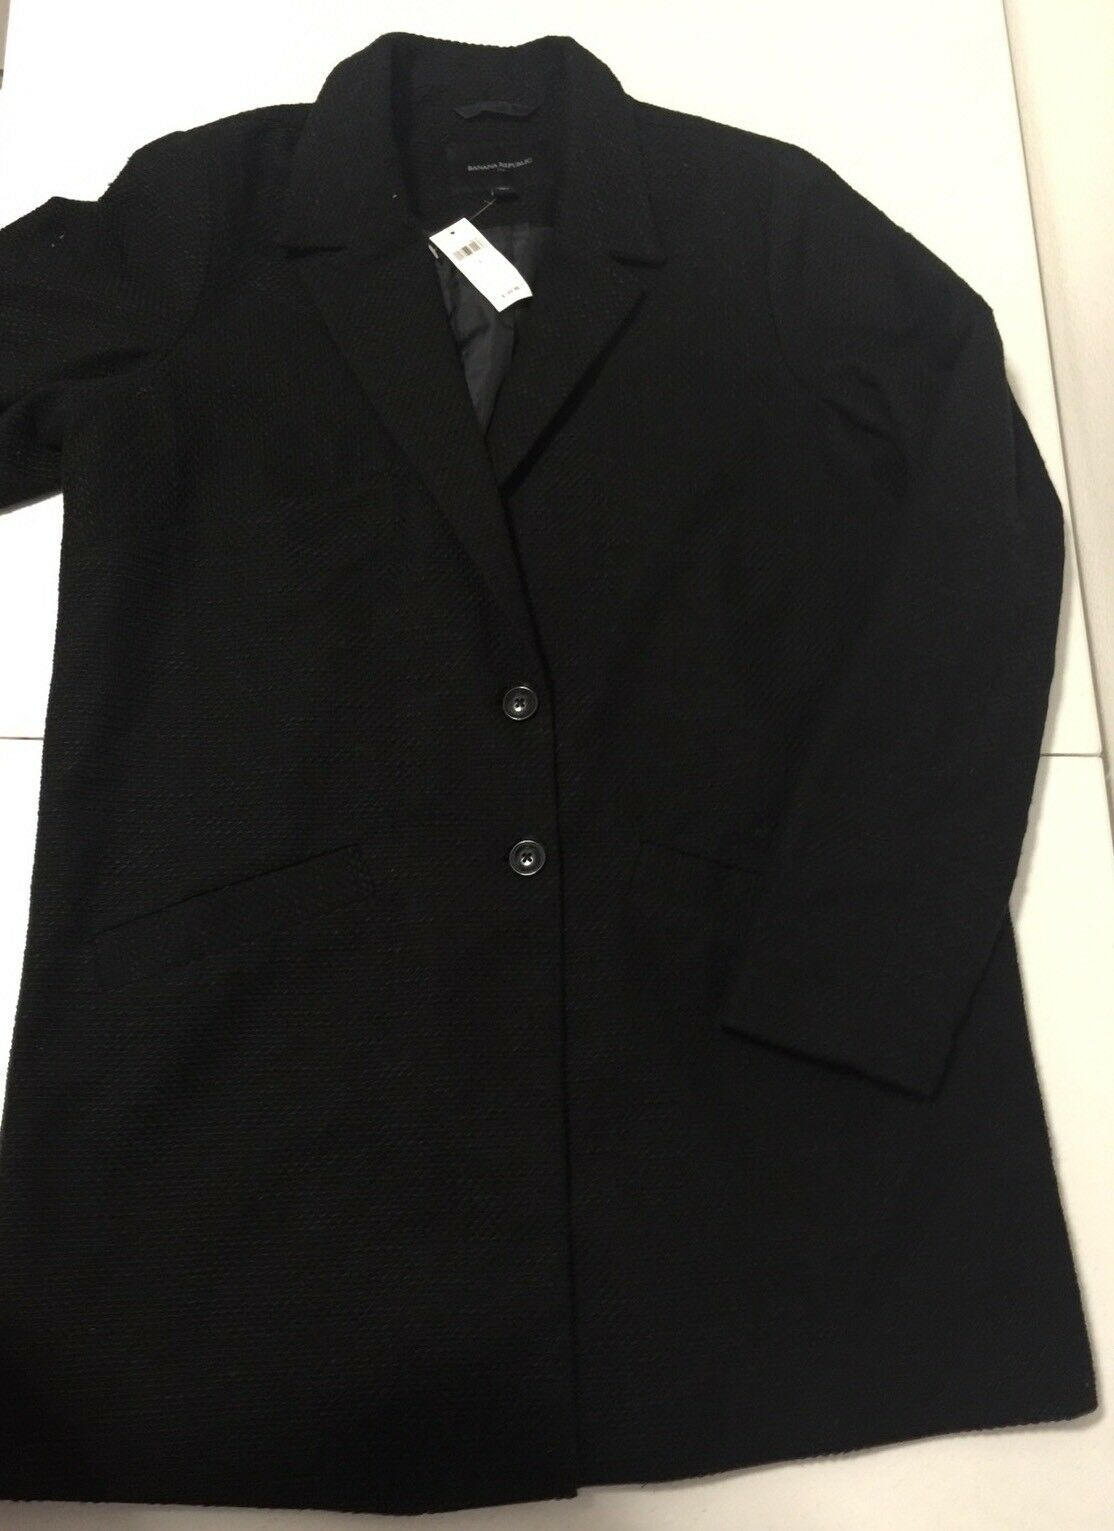 NWT Banana Republic Woherren schwarz Boucle Two Button Lined Jacket Größe L